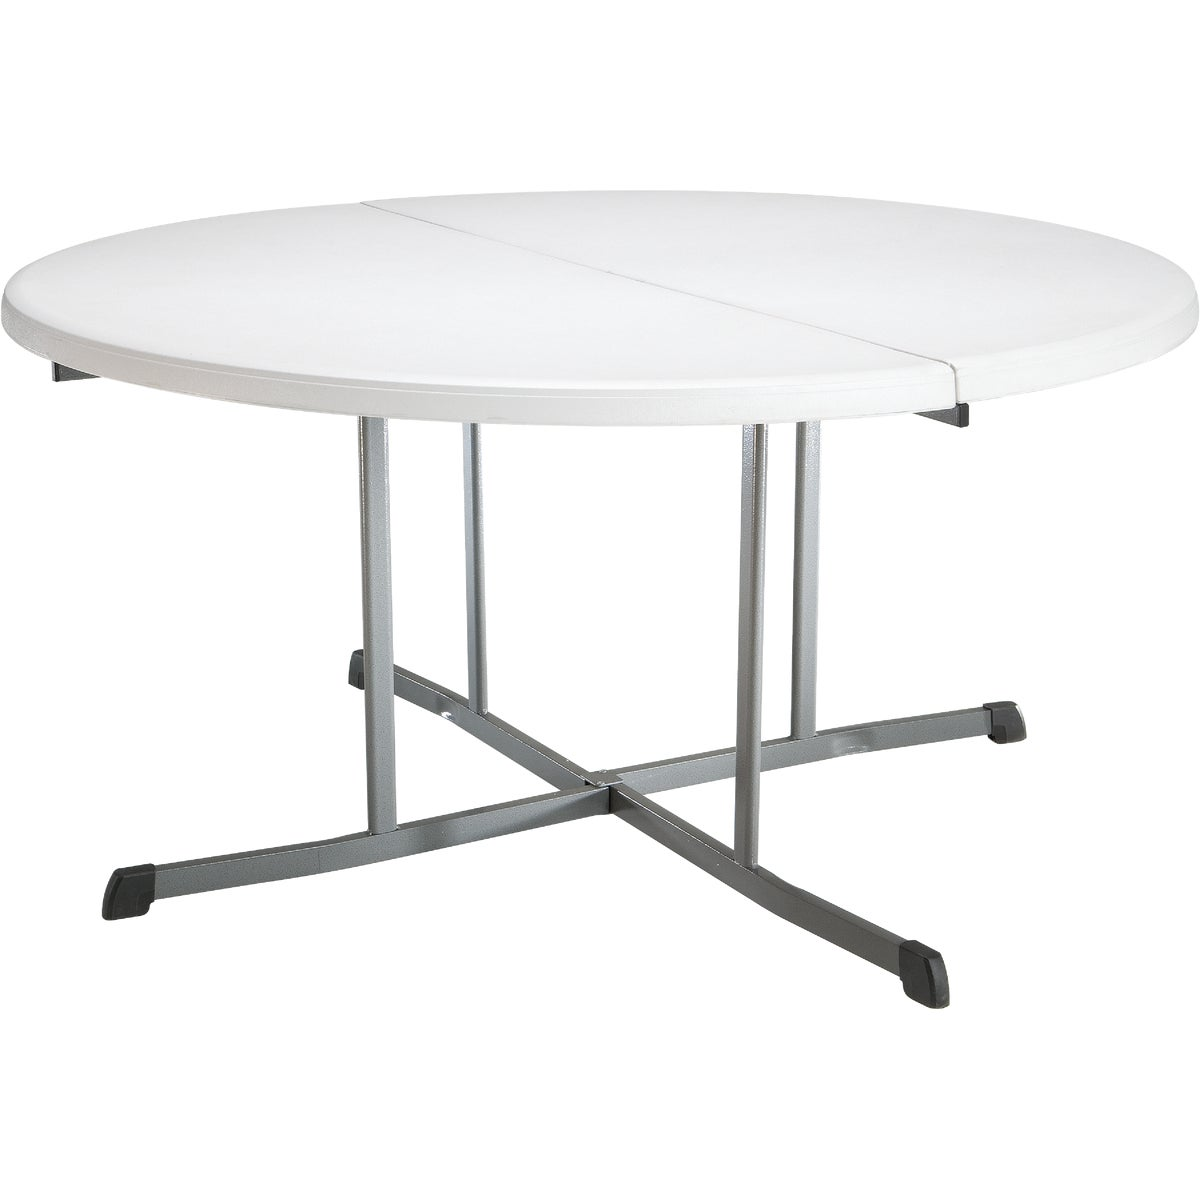 5FT RD FOLD-N-HALF TABLE - 5402 by Lifetime  Xiamen